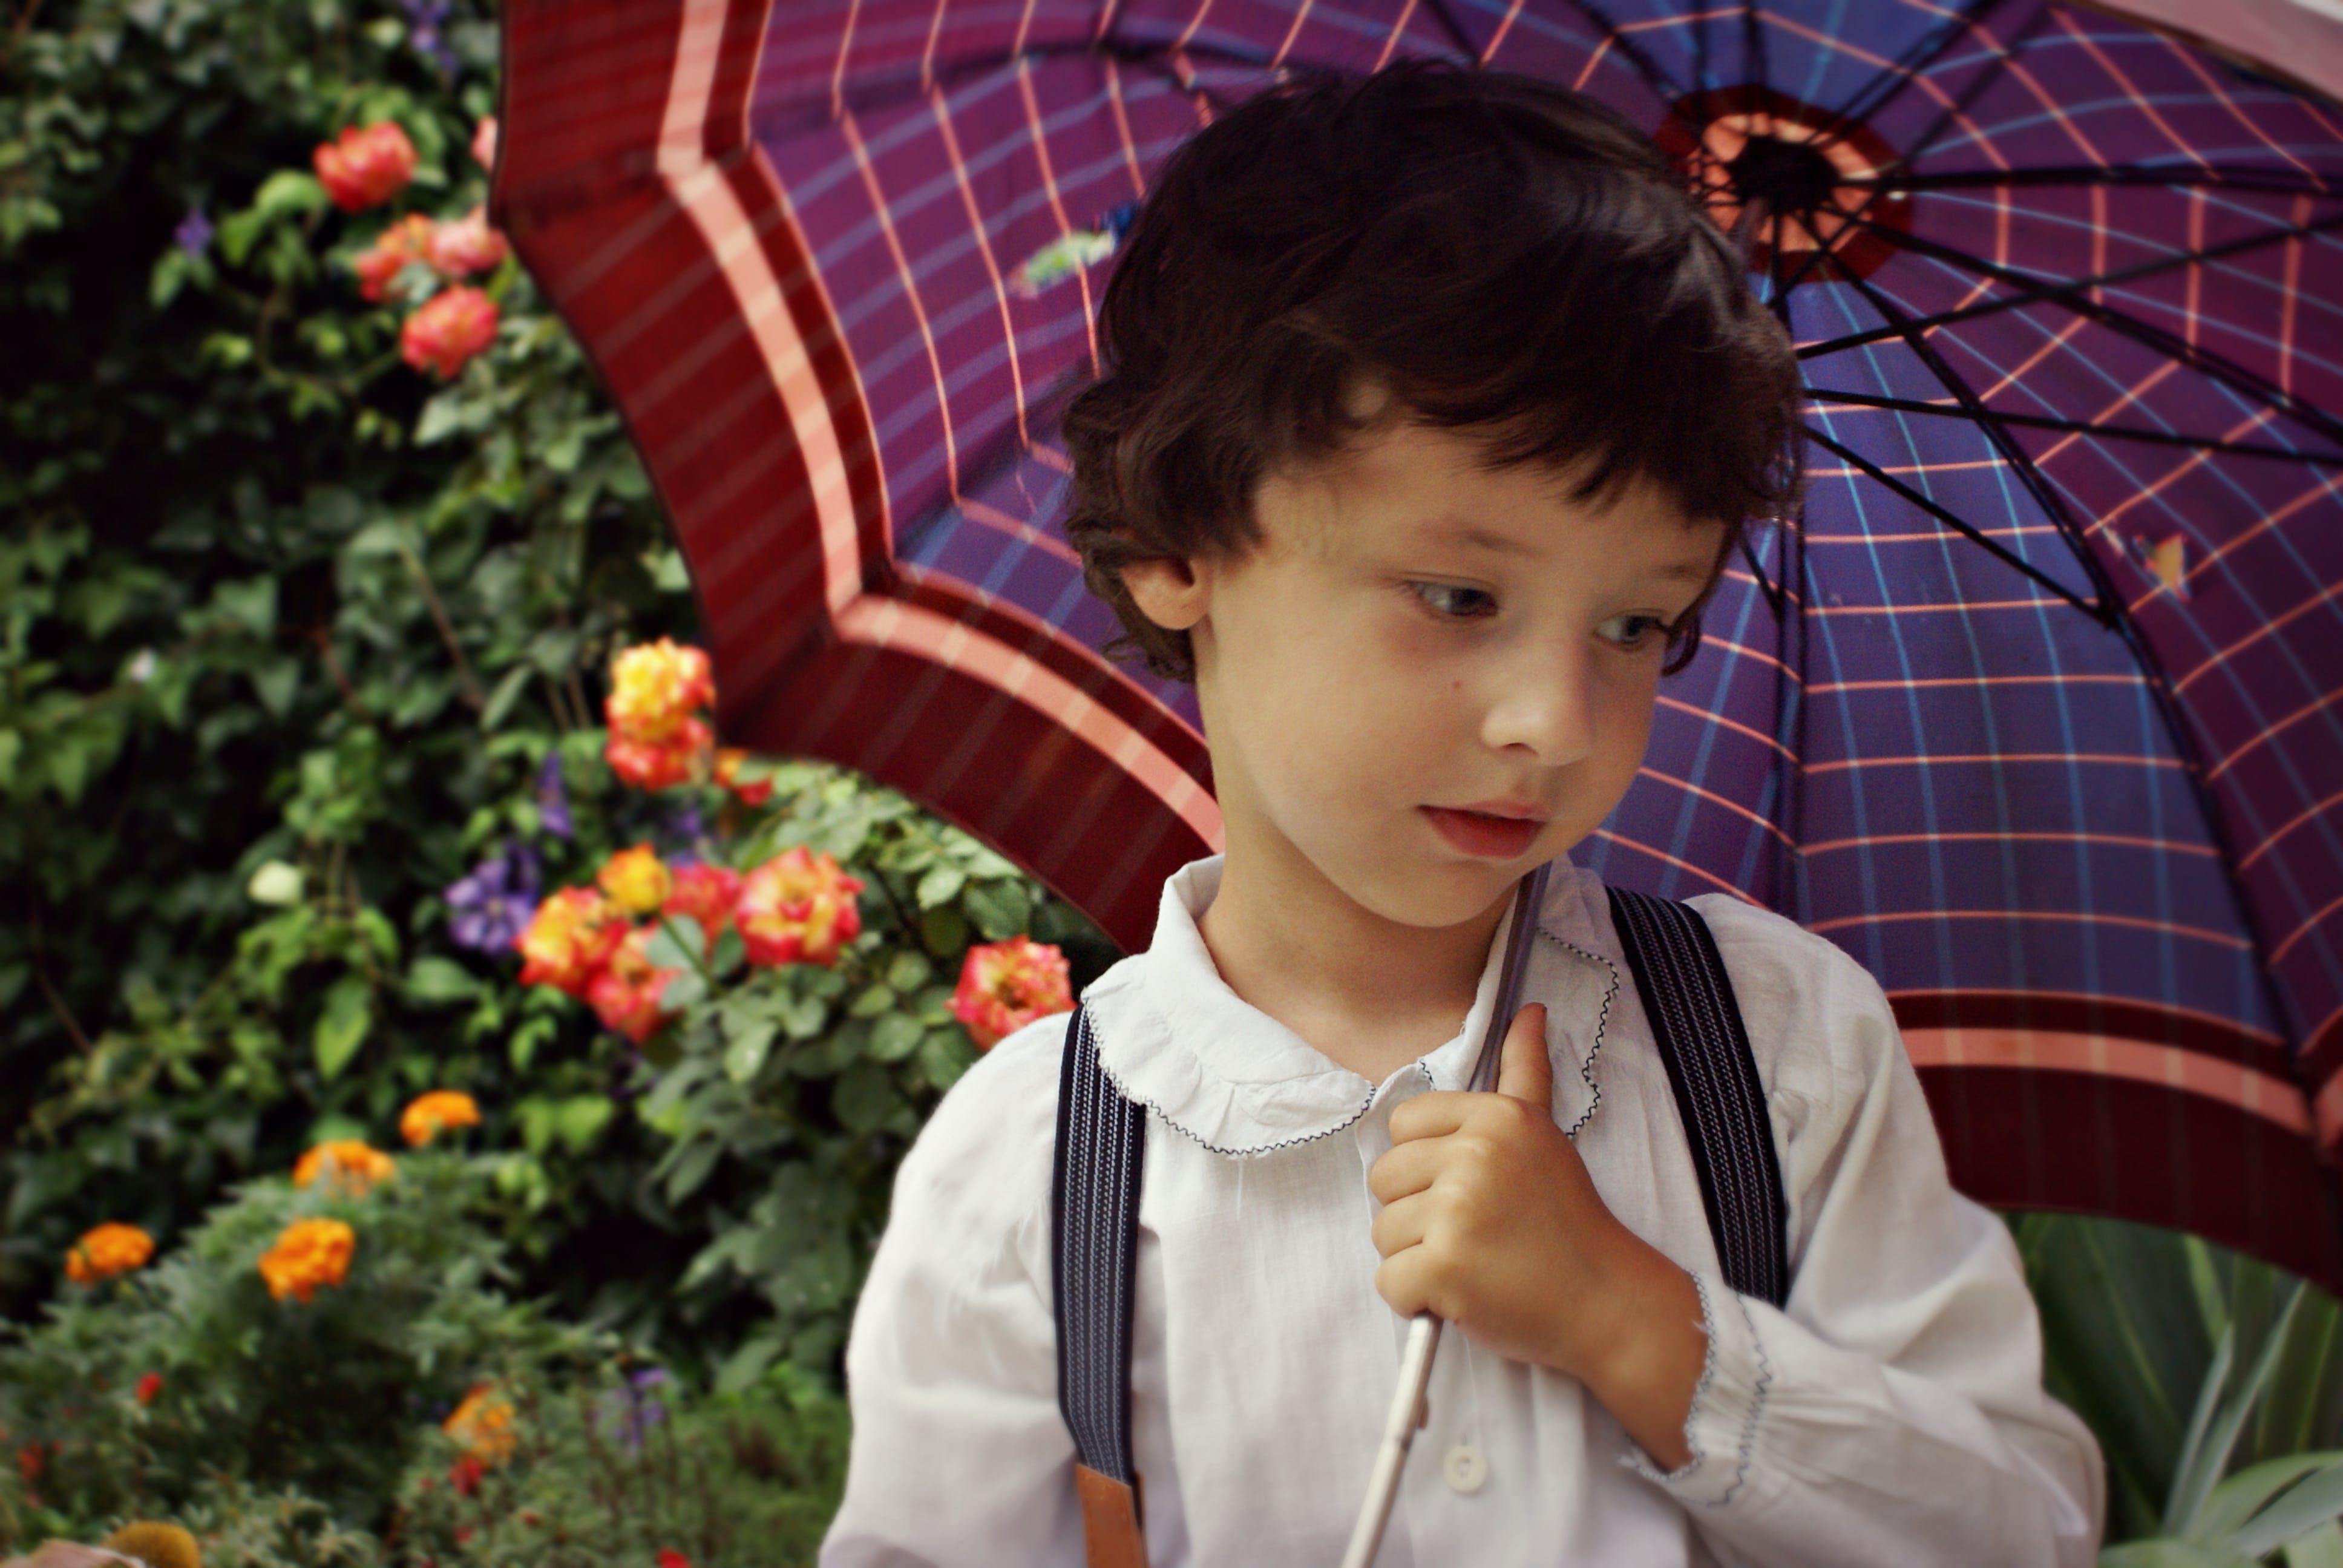 Boy Holding Purple Umbrella